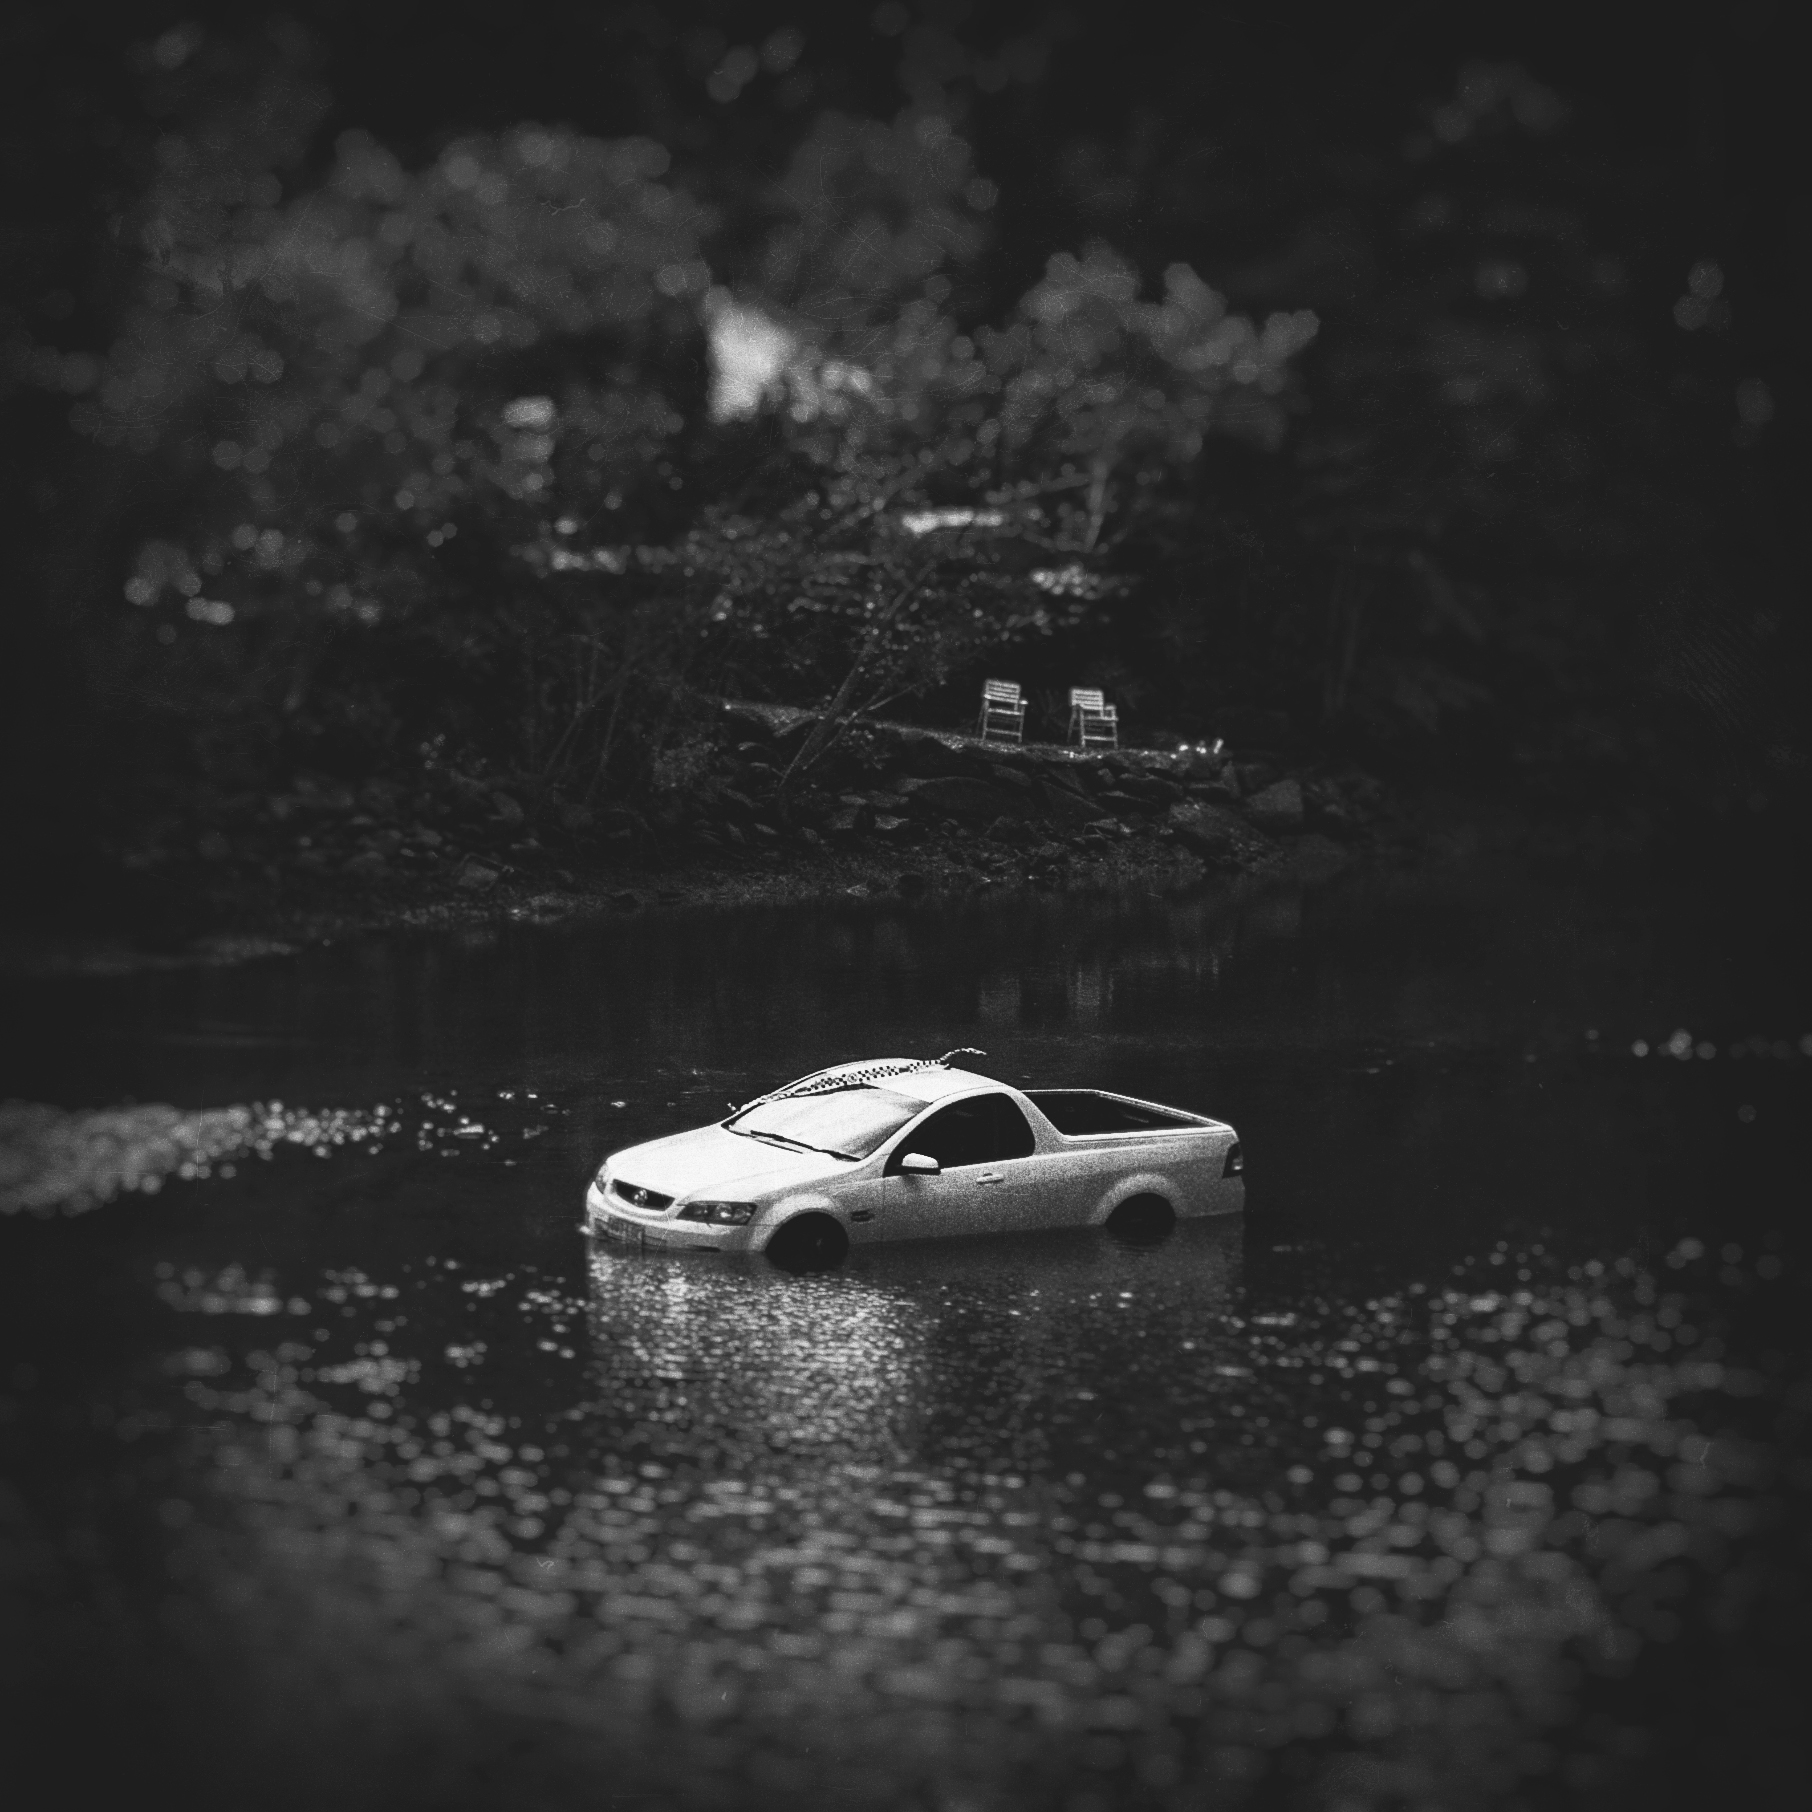 """A Drift gone wrong, Currumbin Valley""             ©Russell Shakespeare 2017"